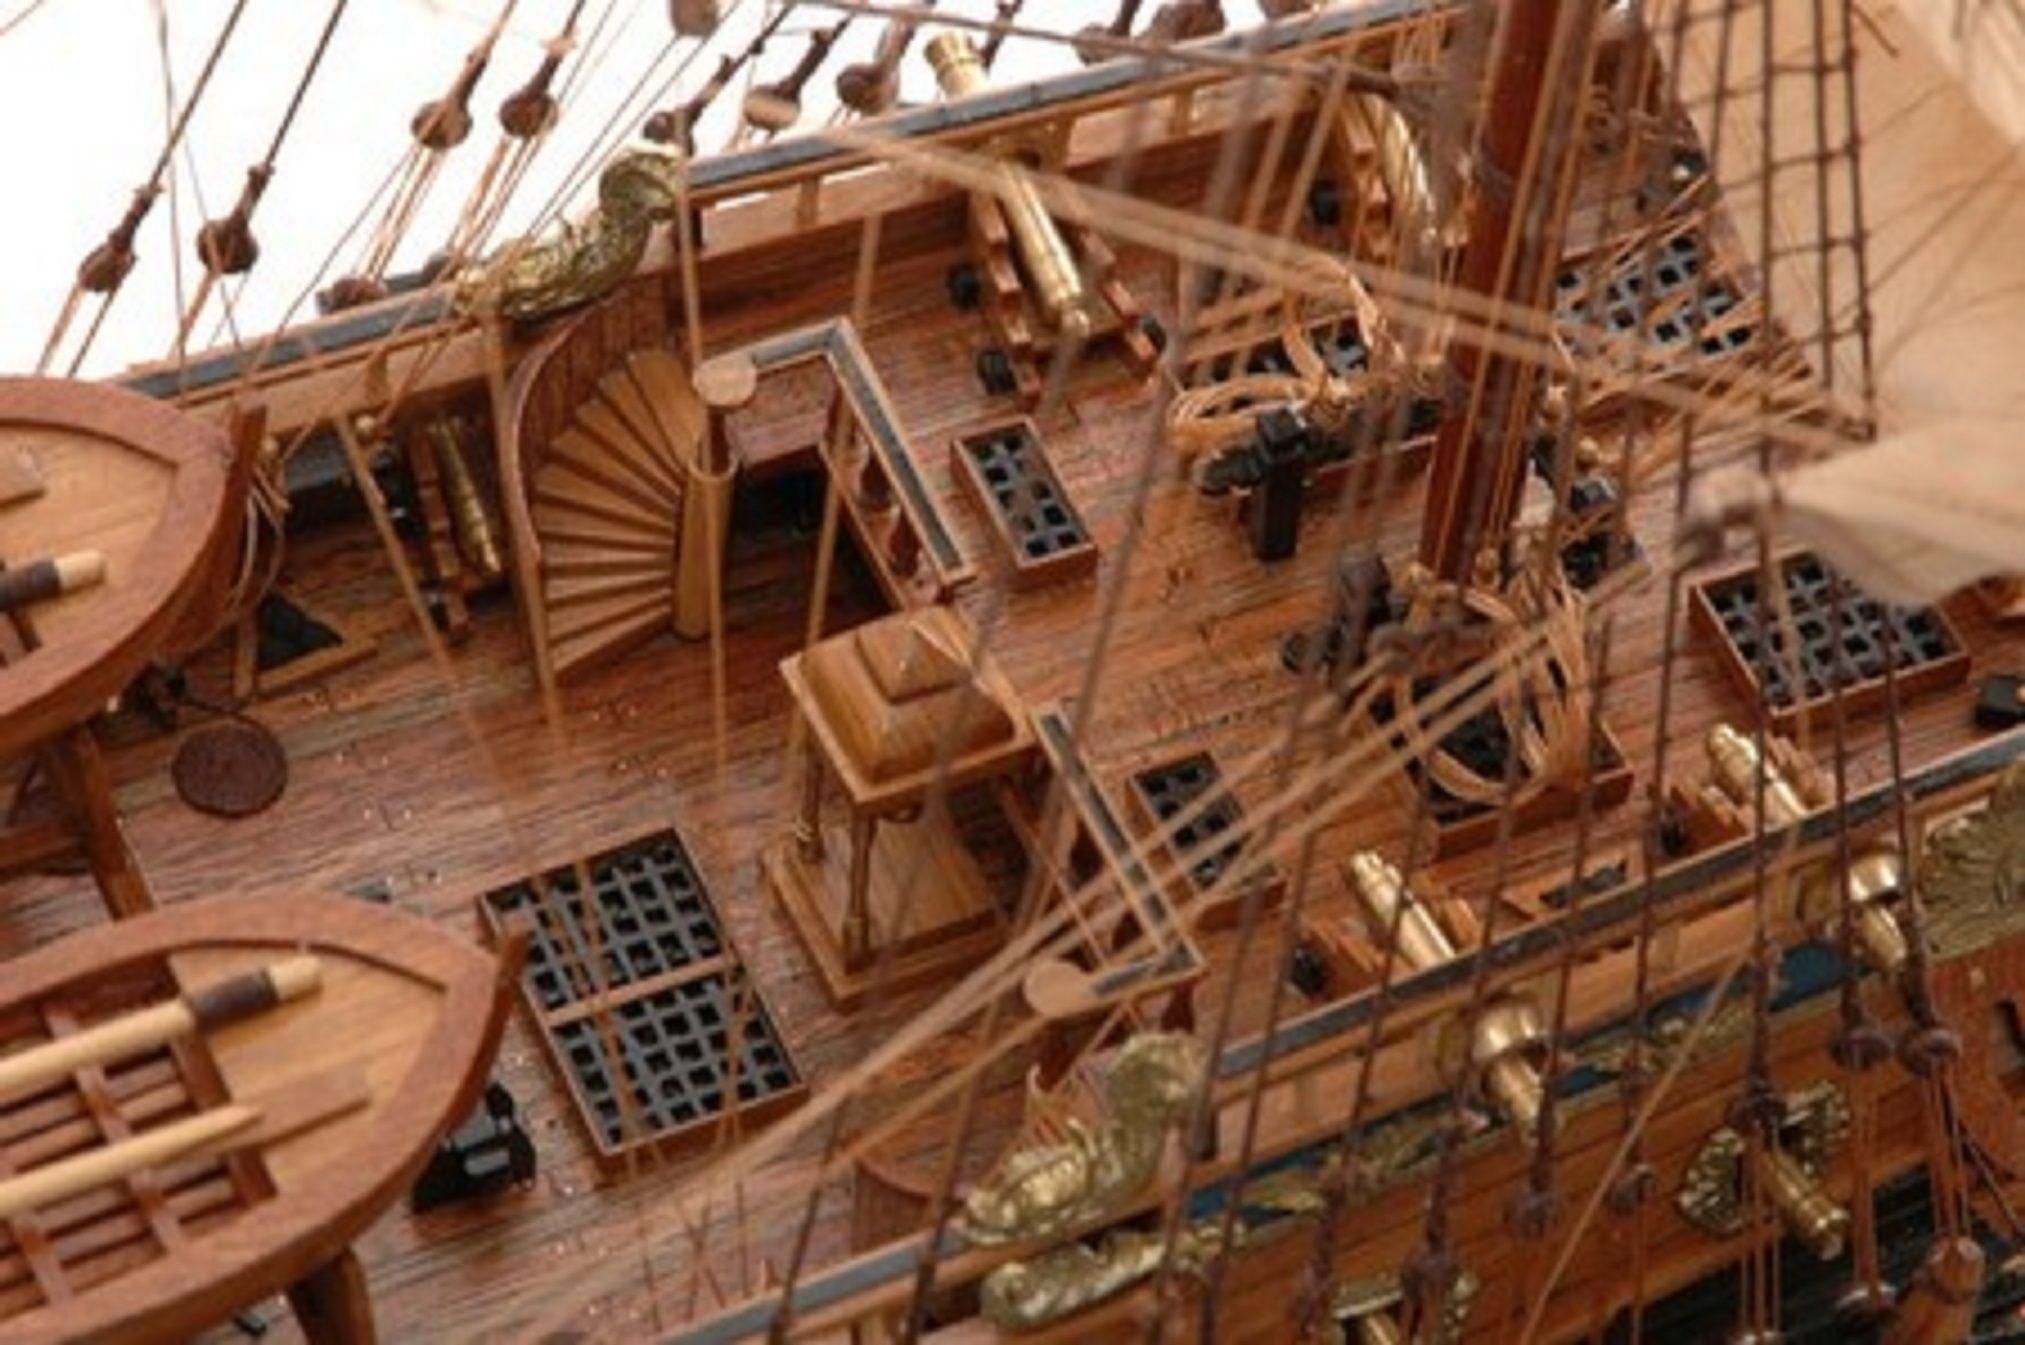 1418-7600-San-Felipe-model-ship-Extra-Large-Premier-Range